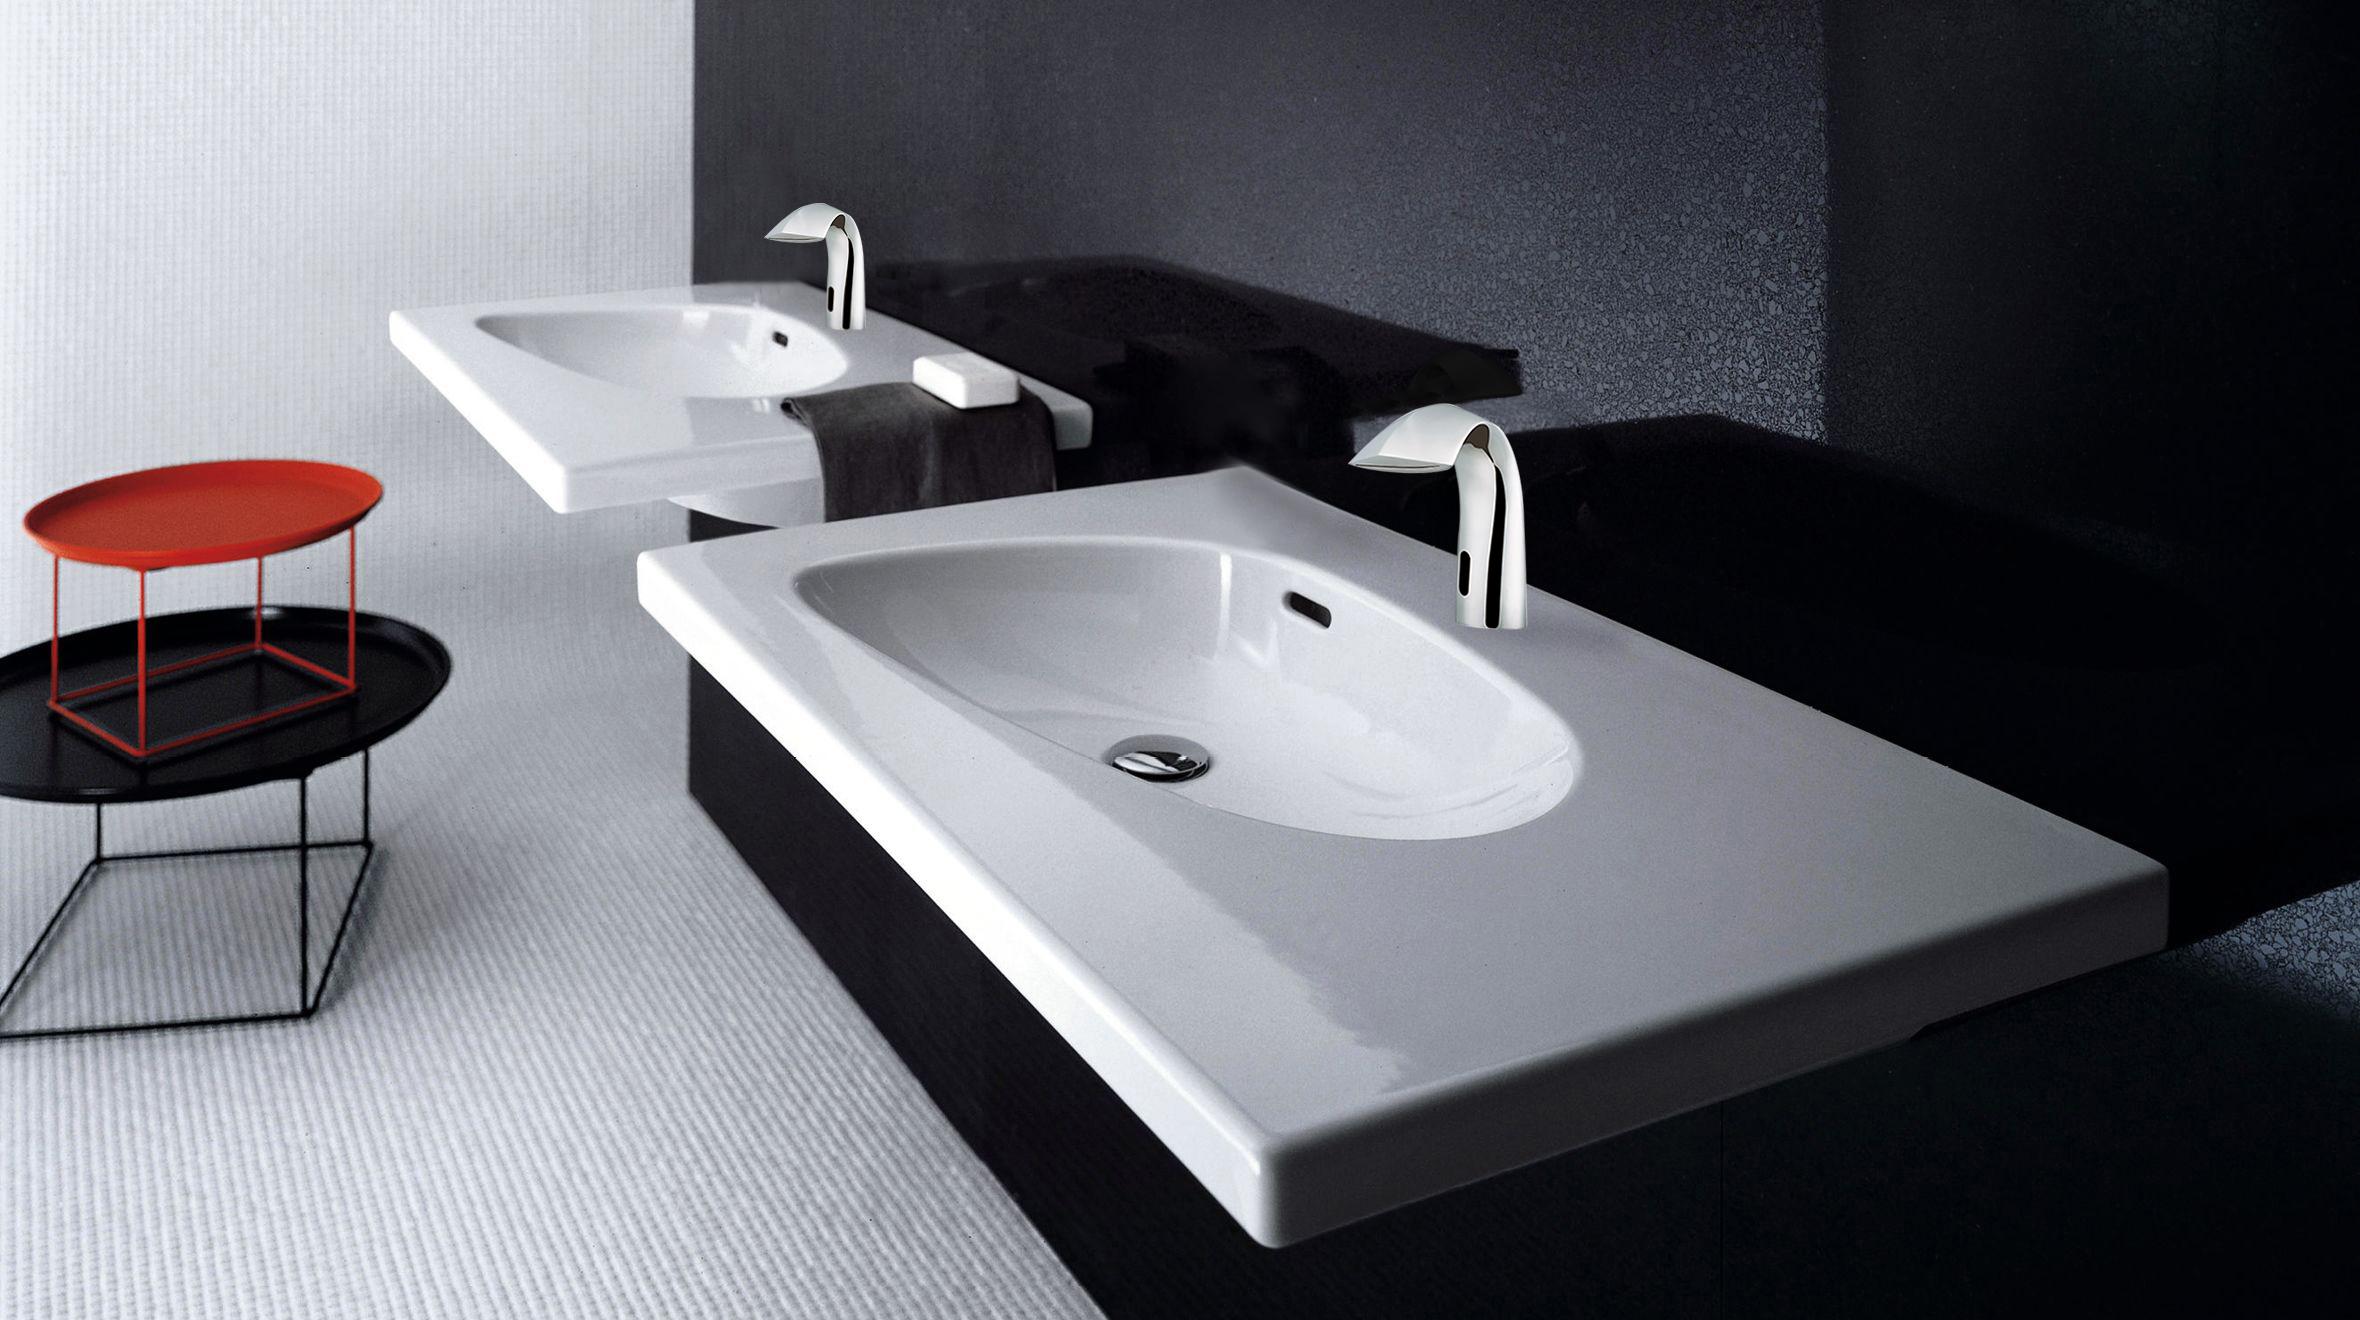 Florenza Commercial Automatic Motion Sensor Faucet CUPC Approved